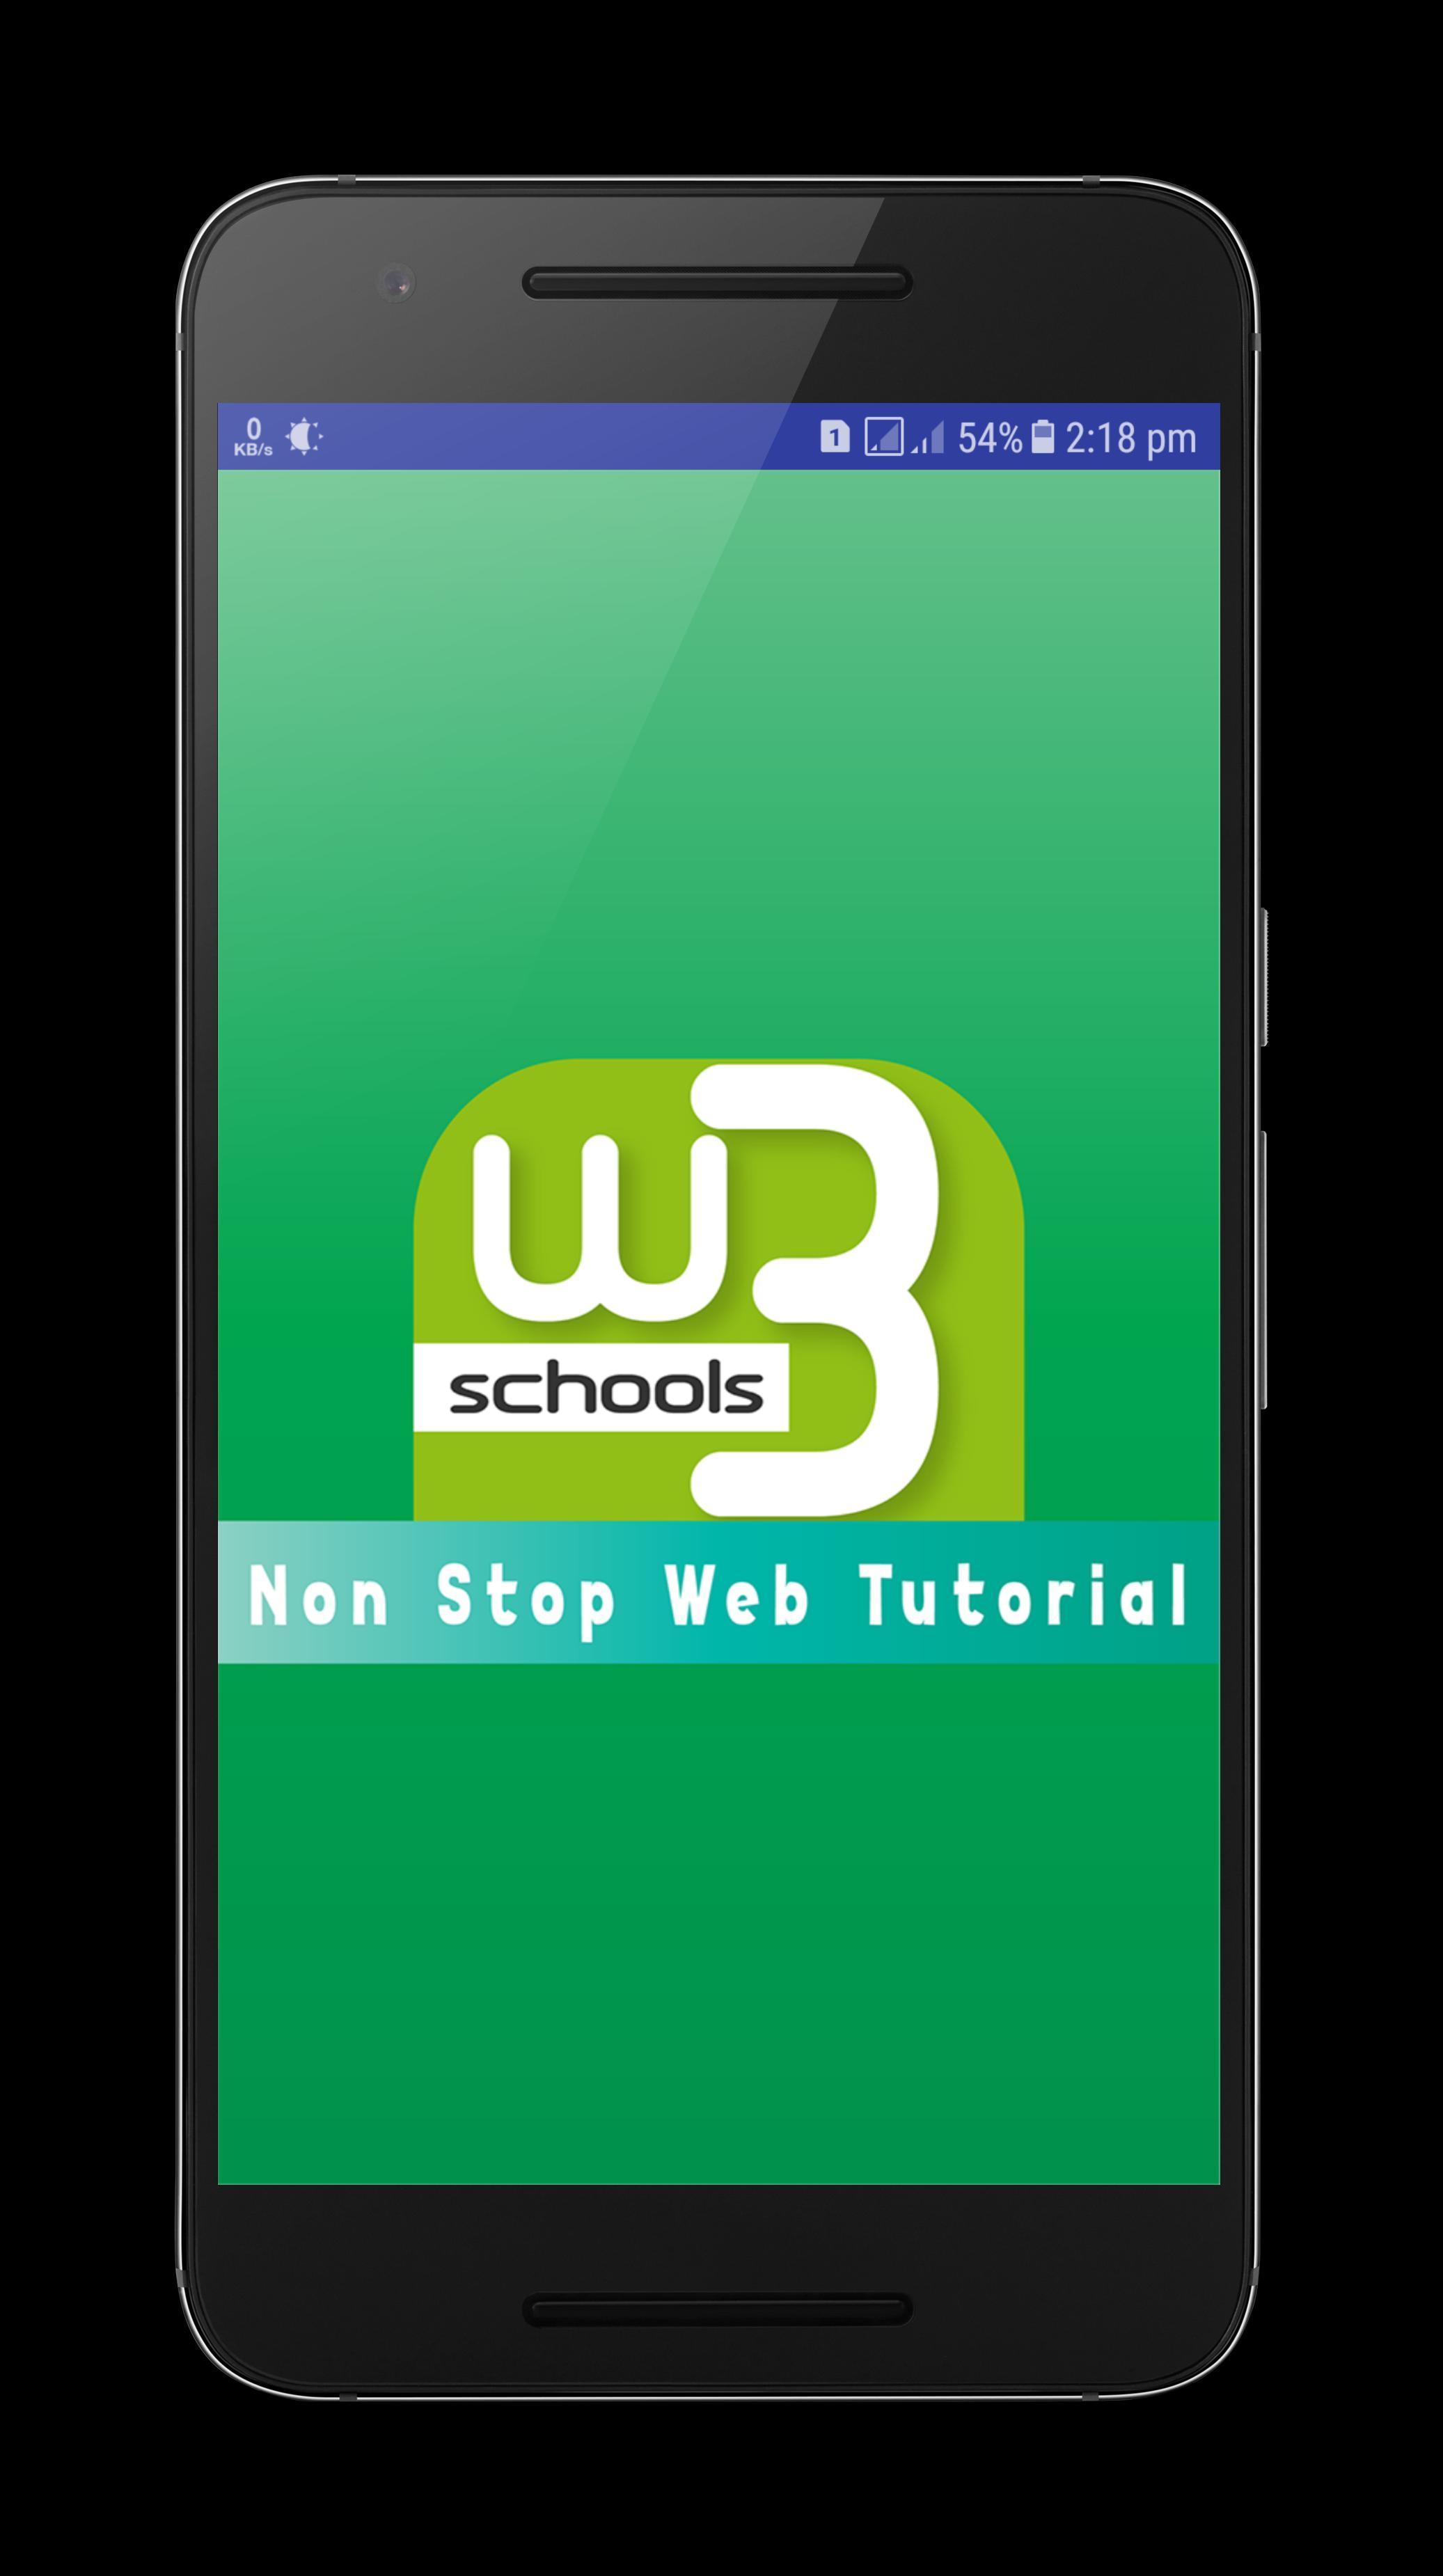 W3Schools Online Web Tutorials for Android - APK Download